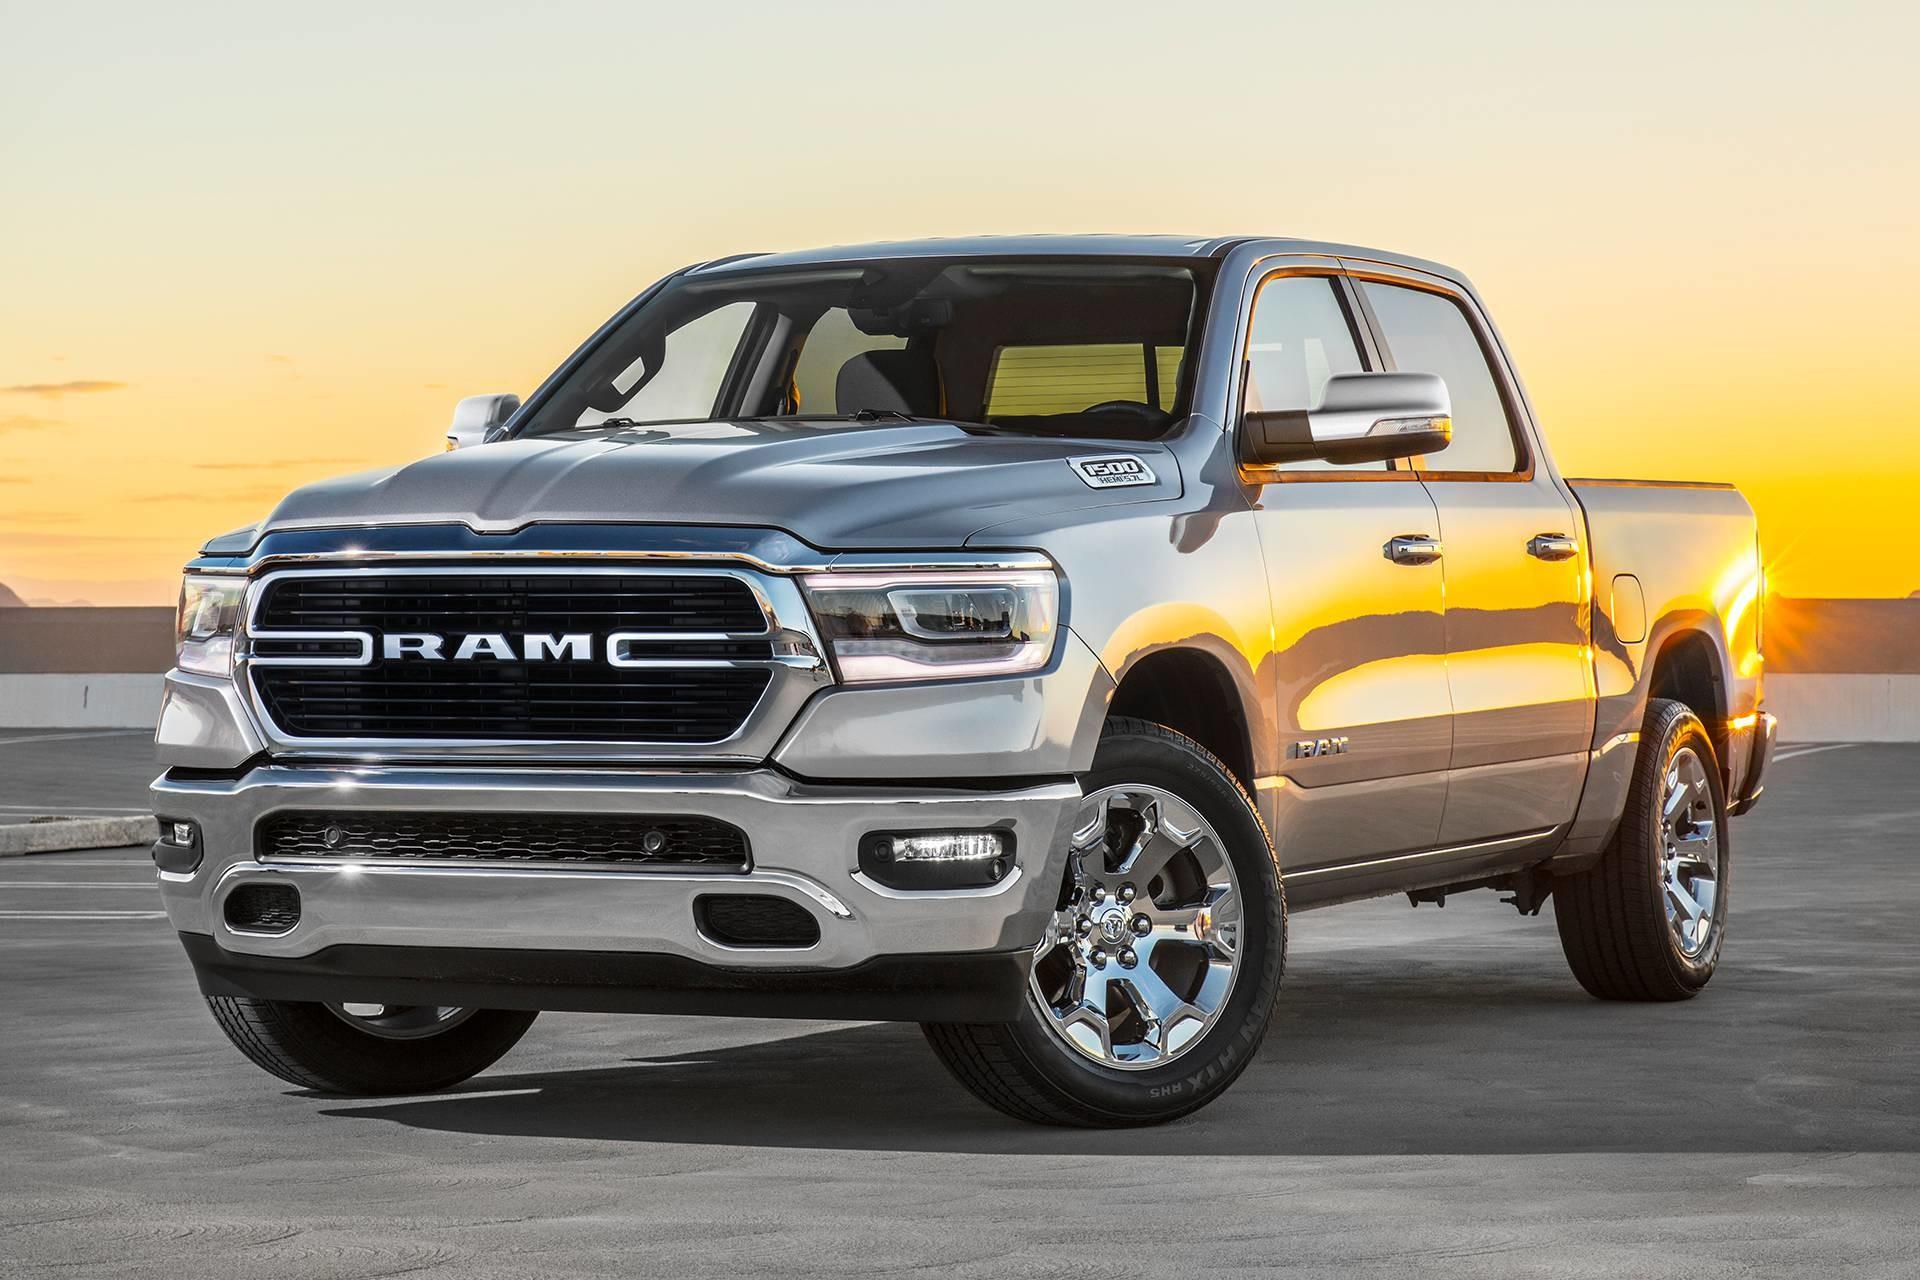 dodge ram incentives canada All-New 2019 RAM 1500 Exterior Gallery  RAM Trucks Canada